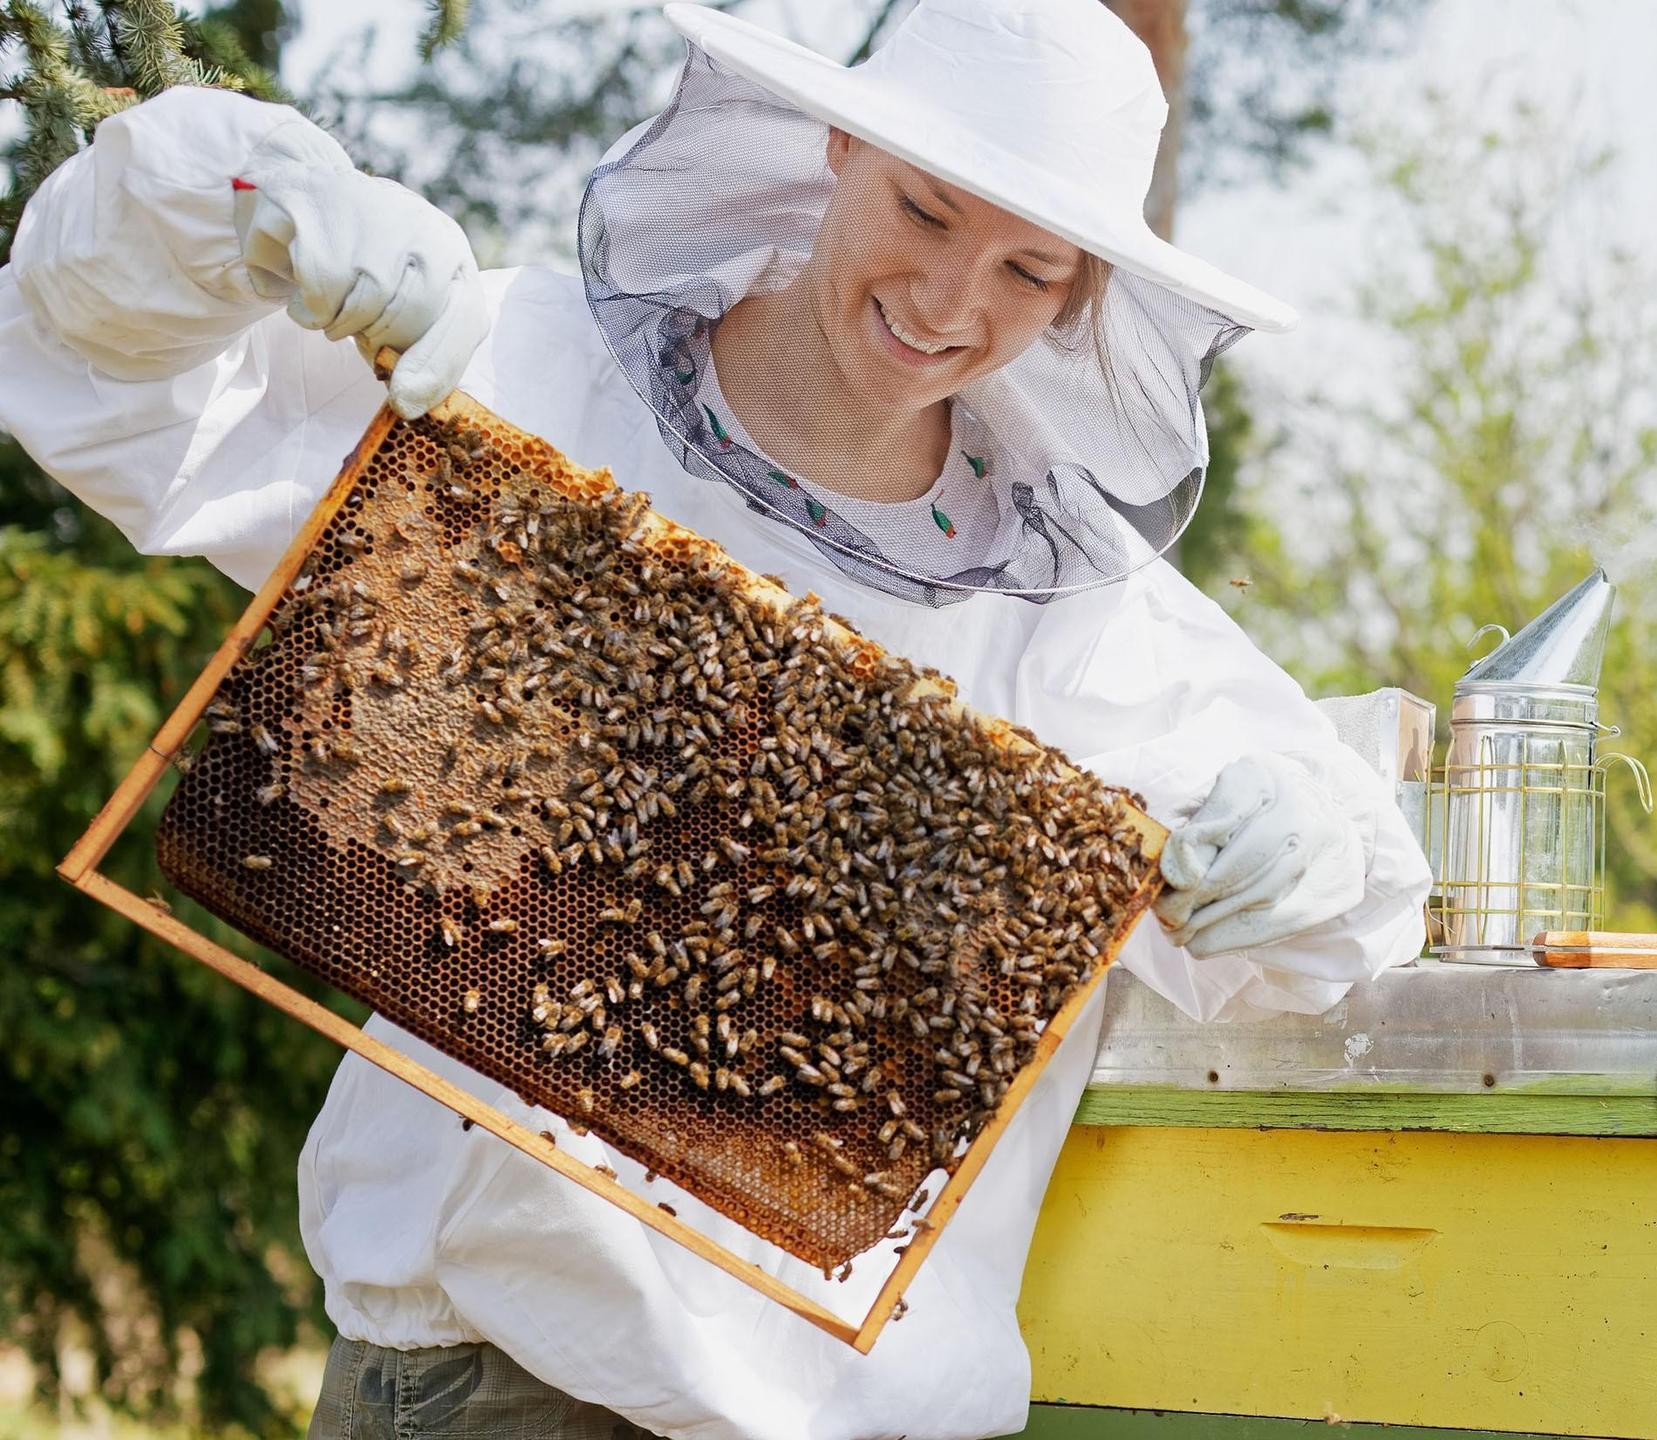 female beekeeper with a frame